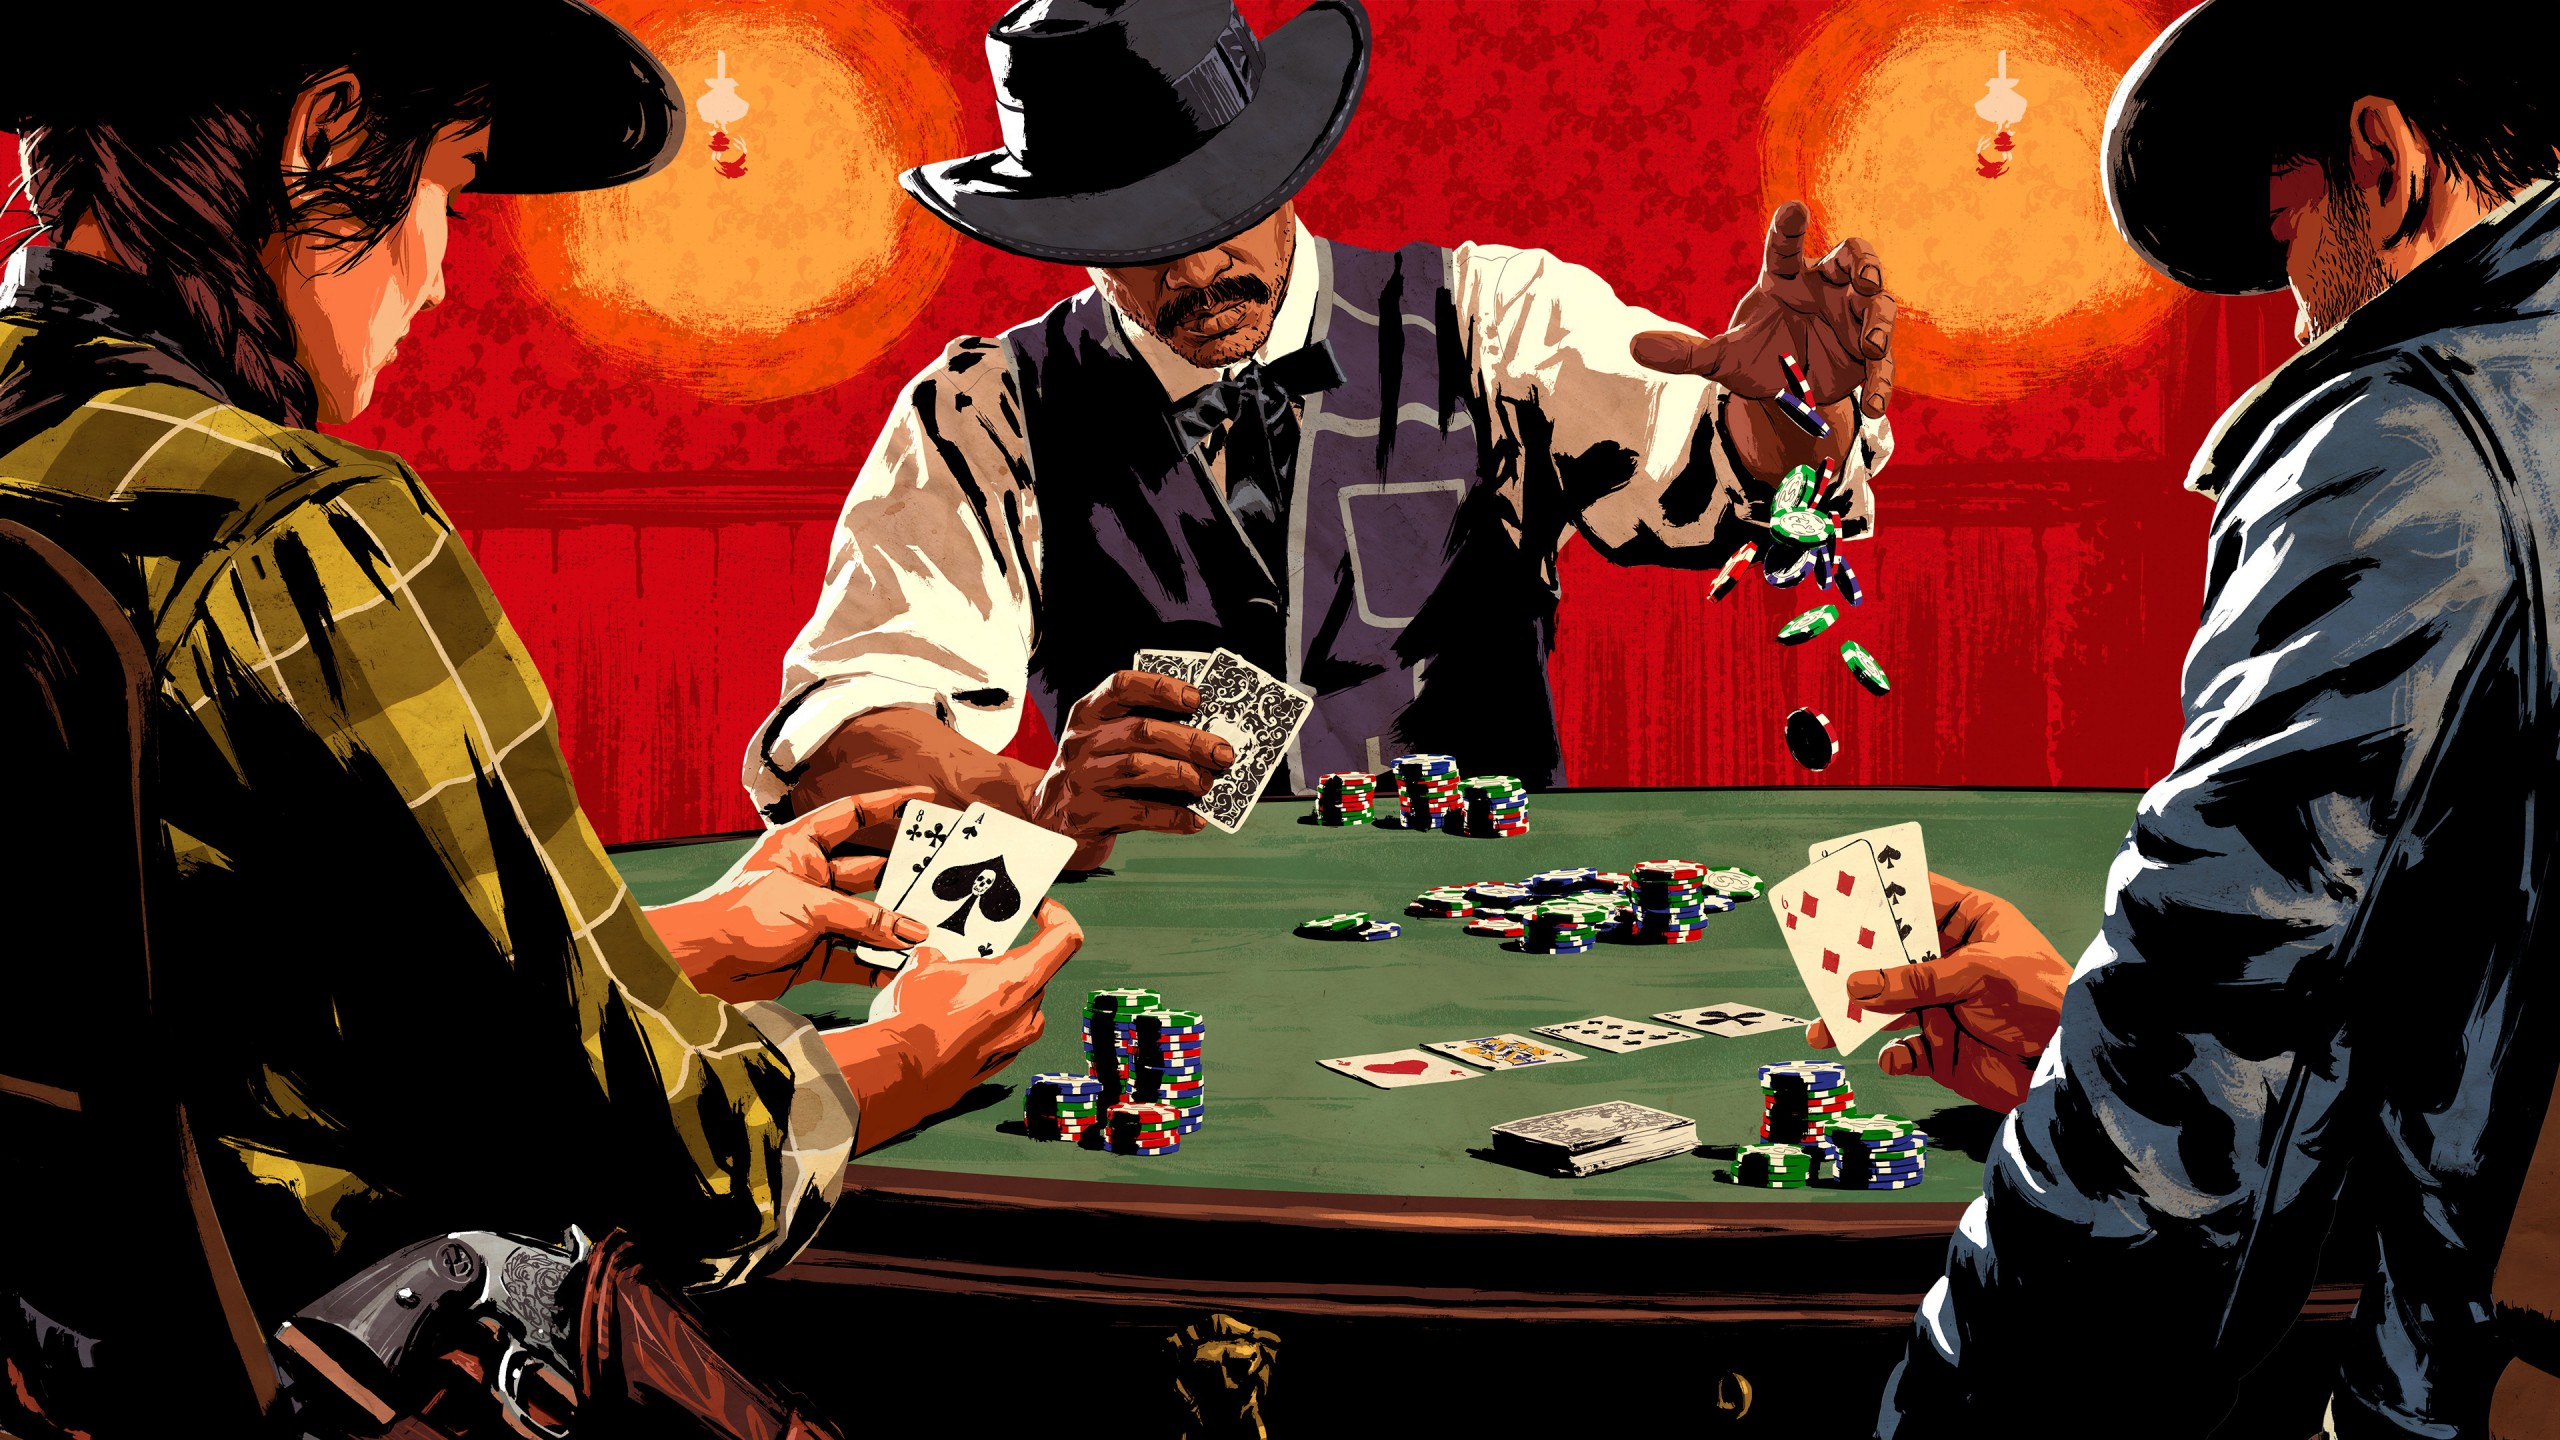 Fondos de pantalla Poker en Red Dead Redemption